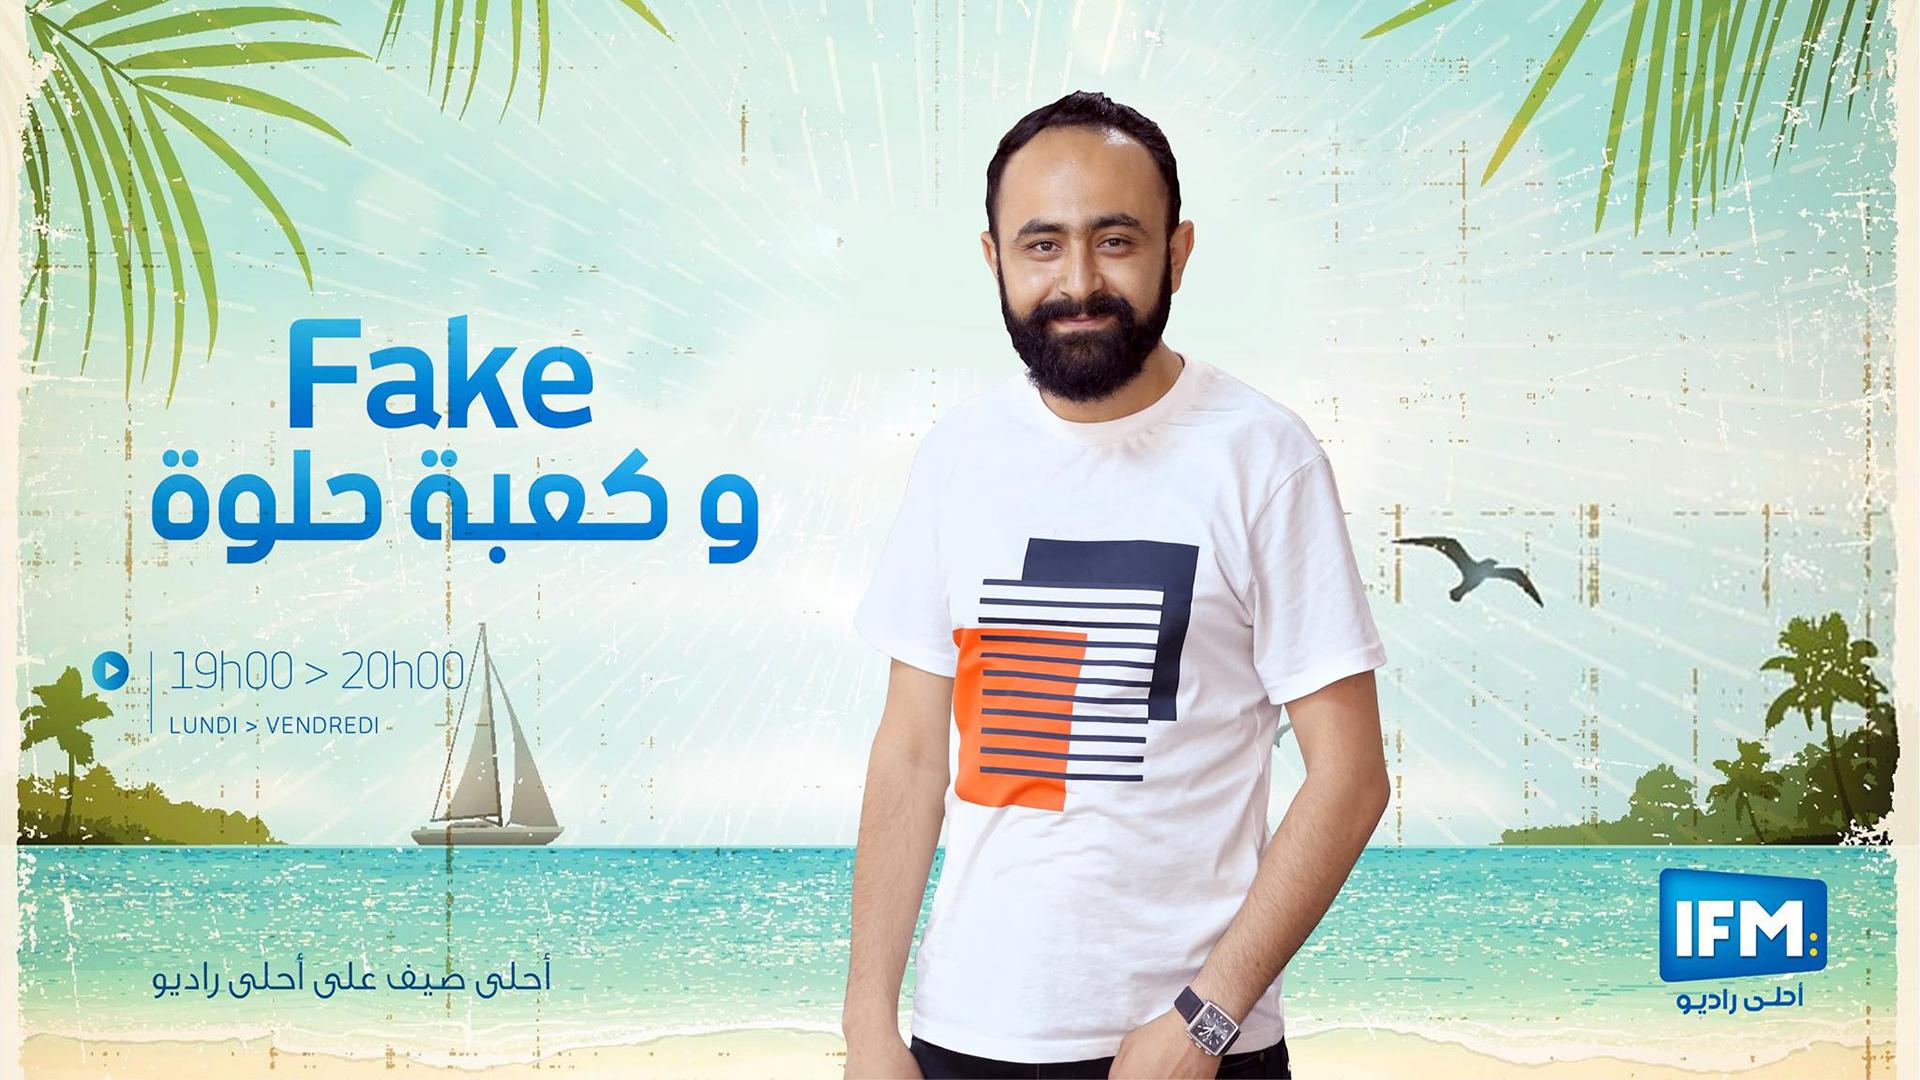 Maa Hatem Fake w ka3ba 7alwa du vendredi 03 Juillet 2020